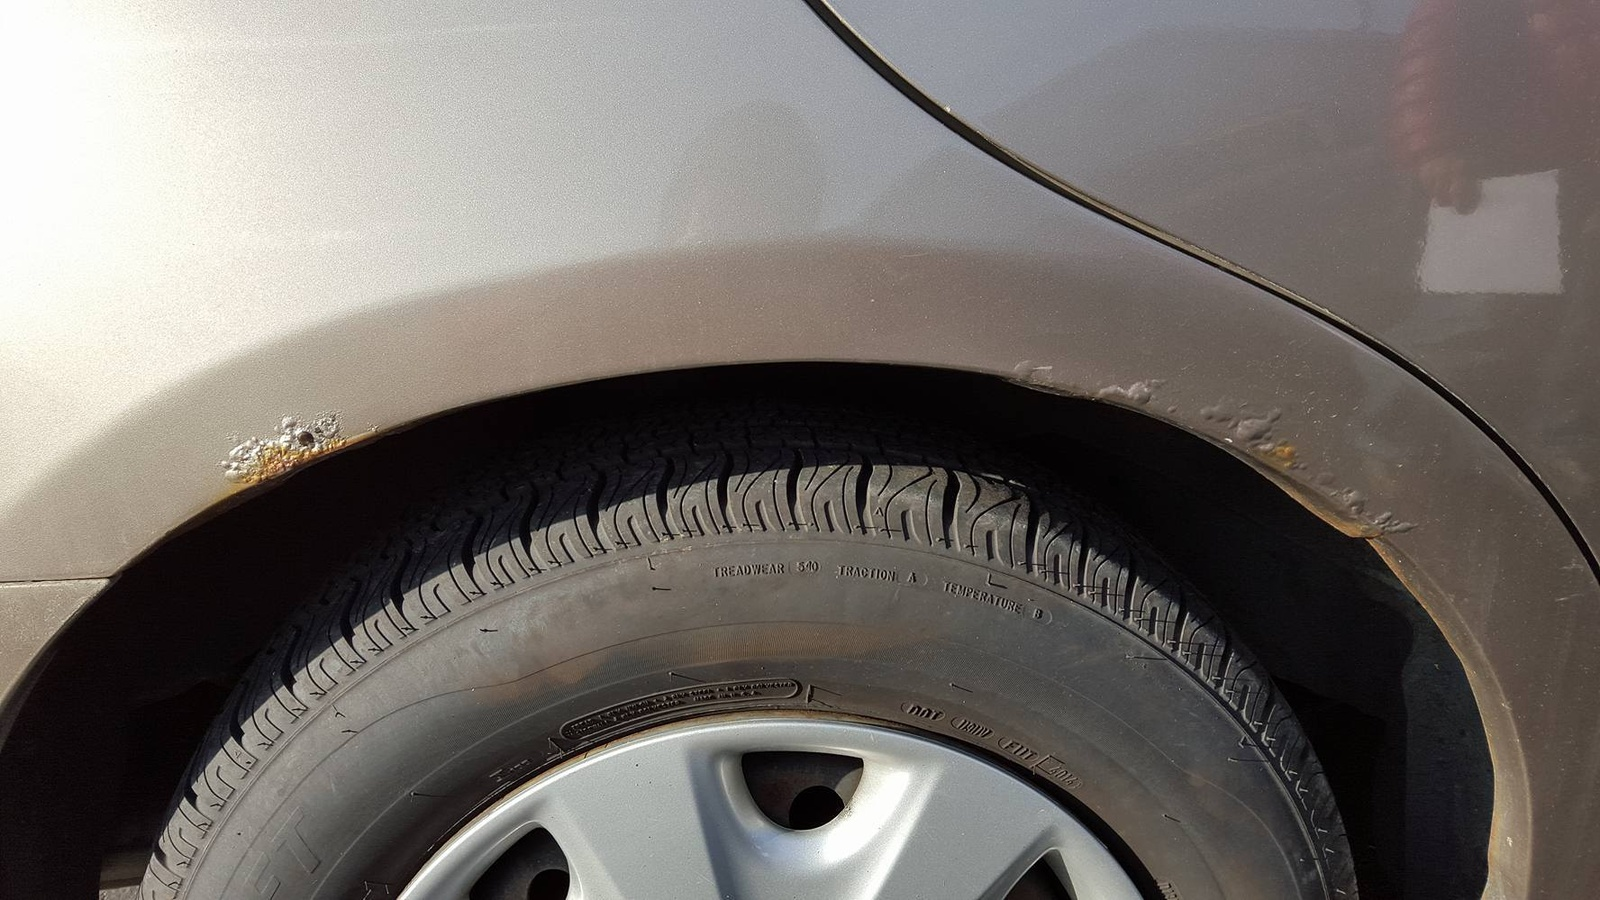 Honda Accord Questions - Rust Issue - CarGurus